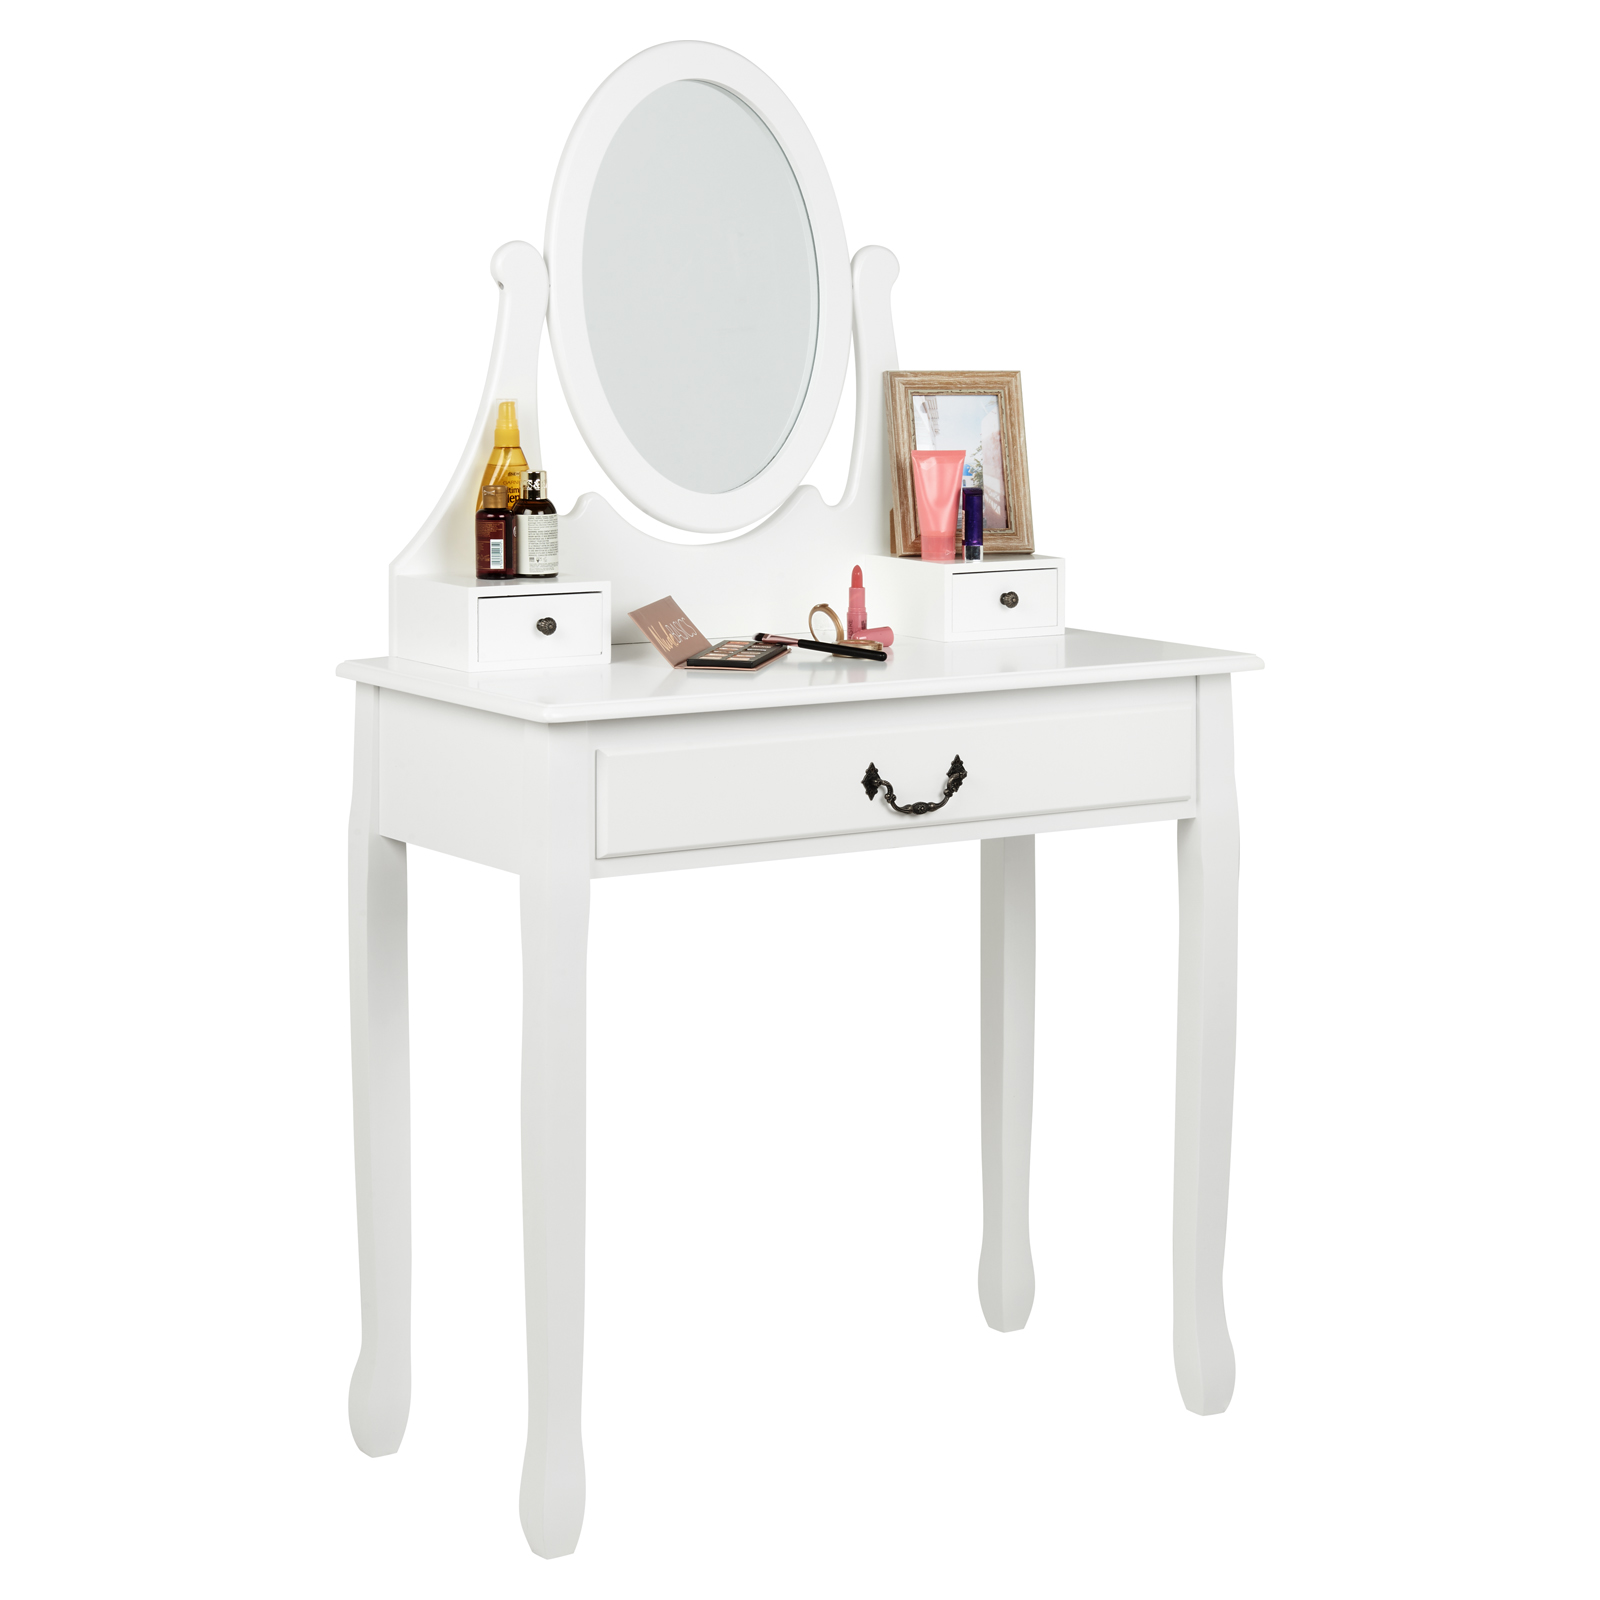 Details About Hartleys White 3 Drawer Dressing Table Oval Mirror Bedroom Makeup Vanity Desk